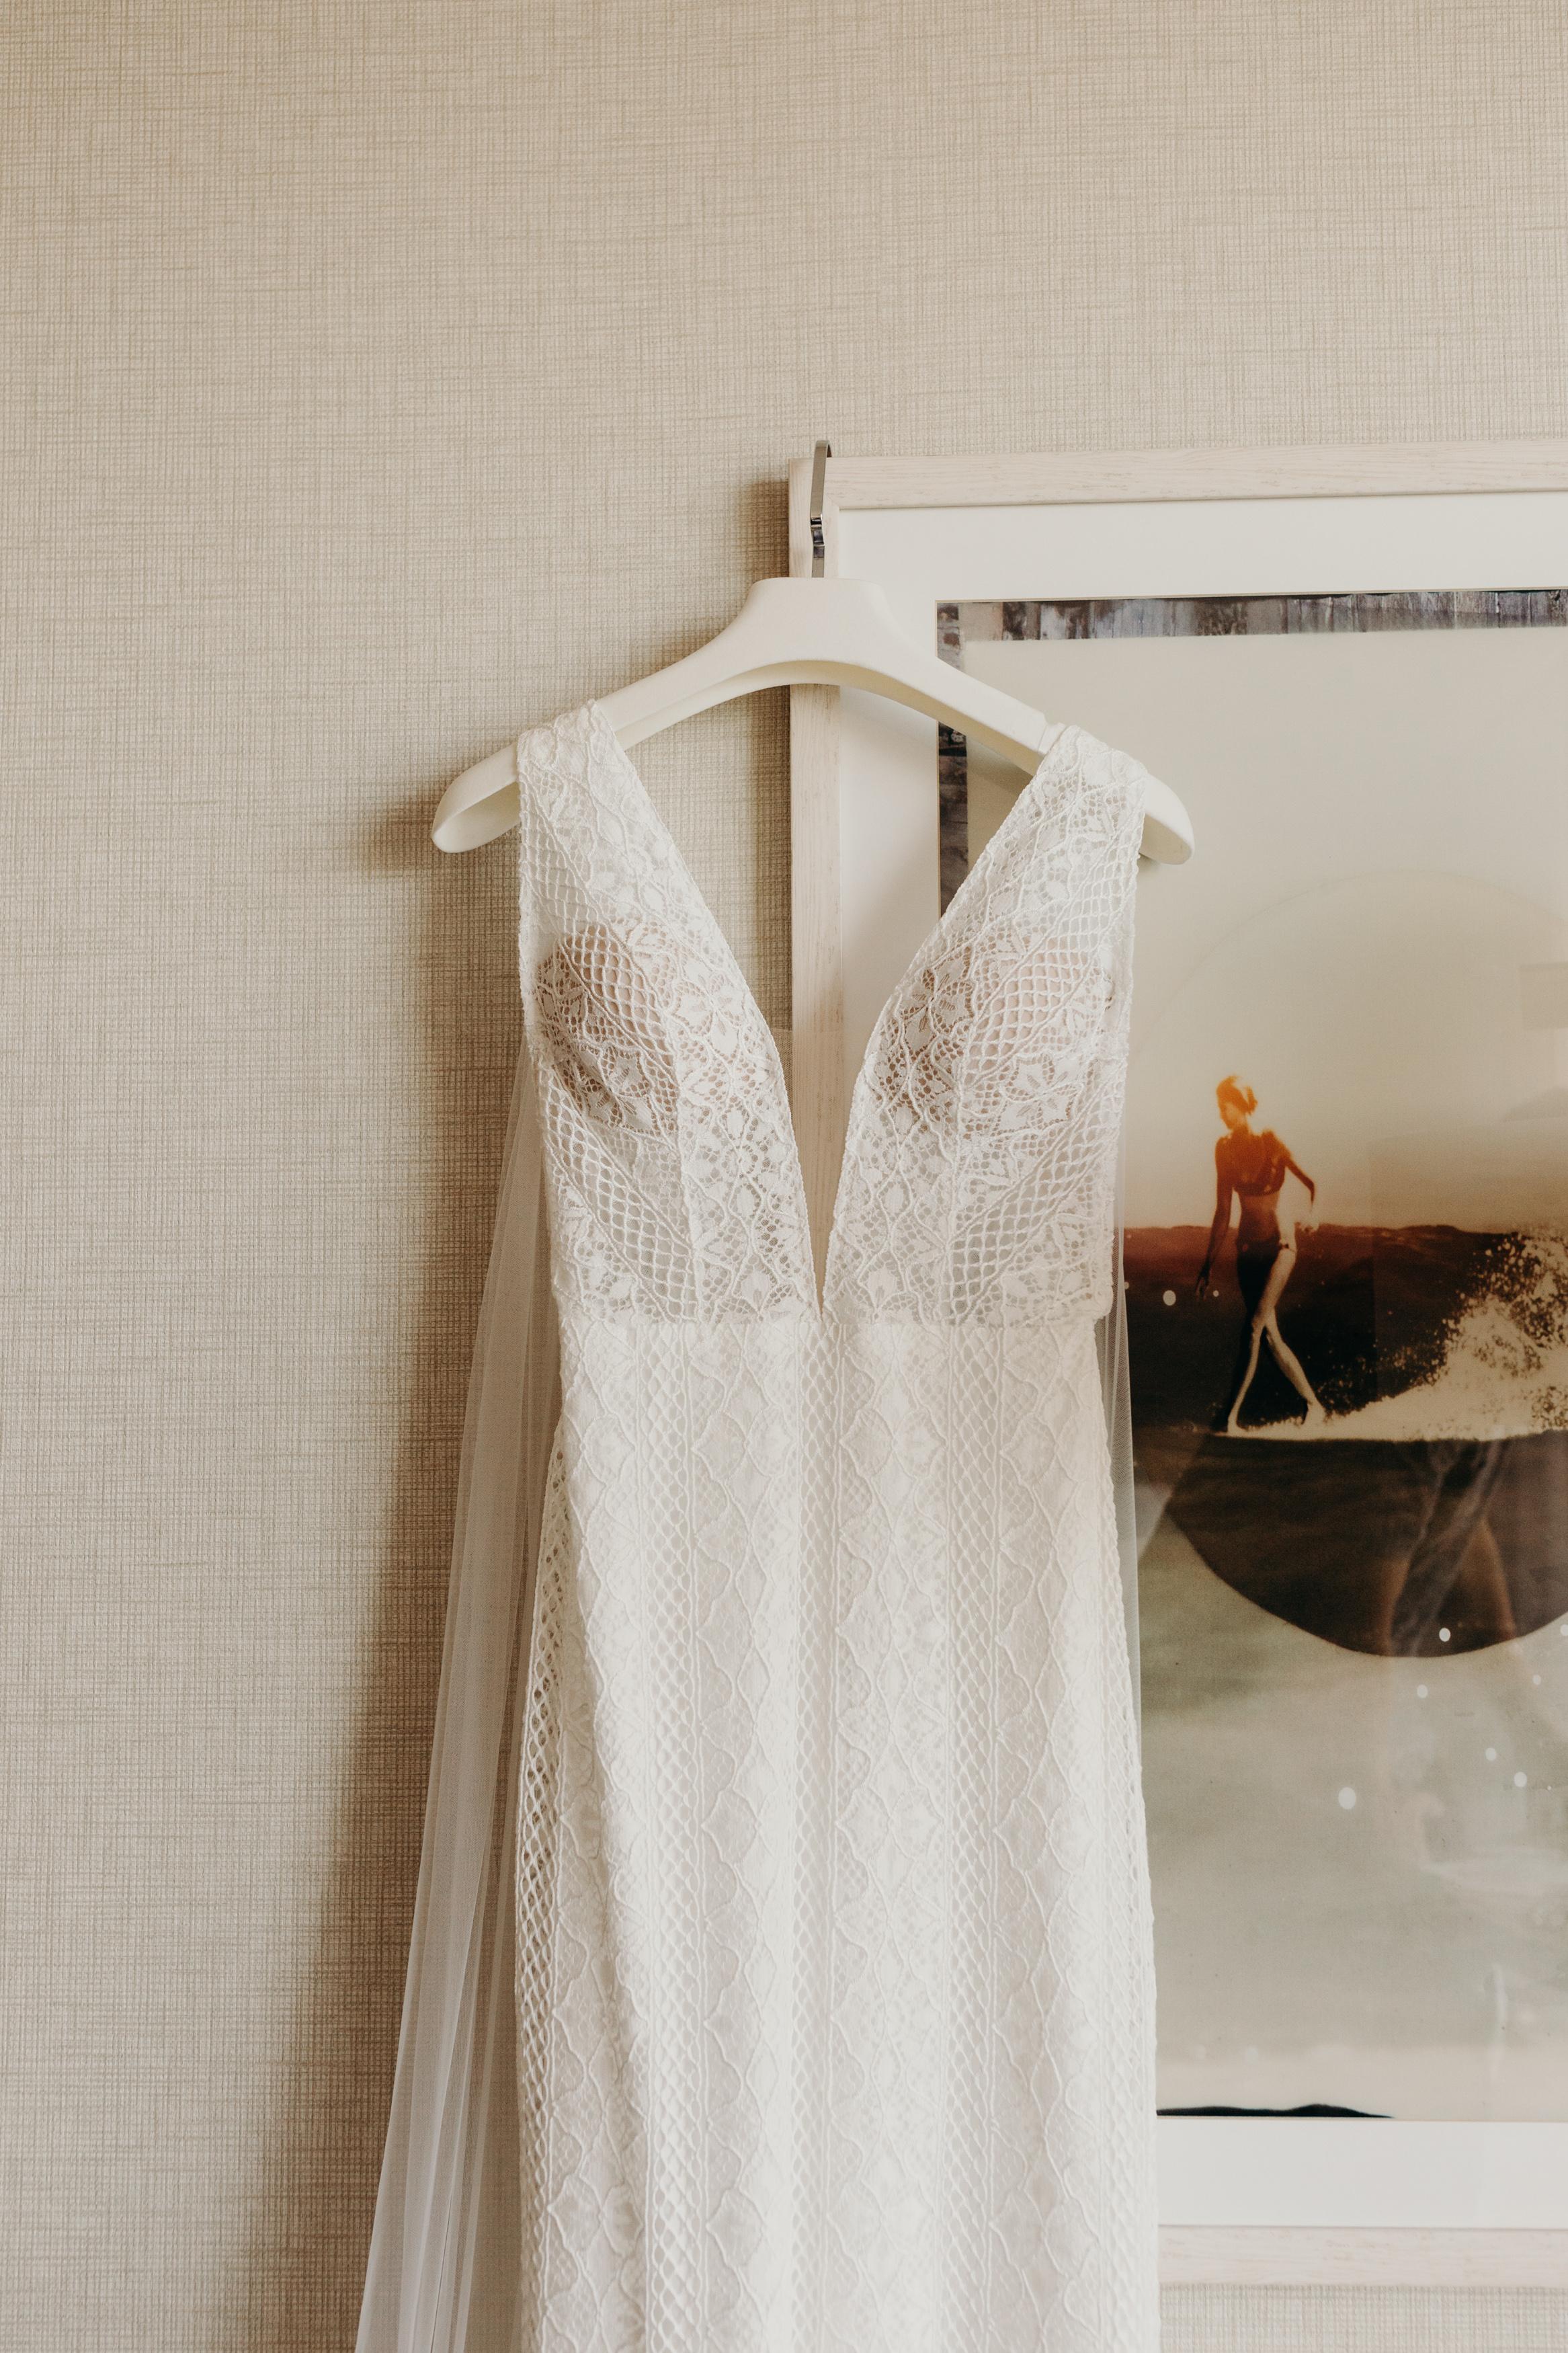 HAWAII-WEDDING-PHOTOGRAPHER-ALOHILANI-RESORT-KEANI-BAKULA-3.jpg